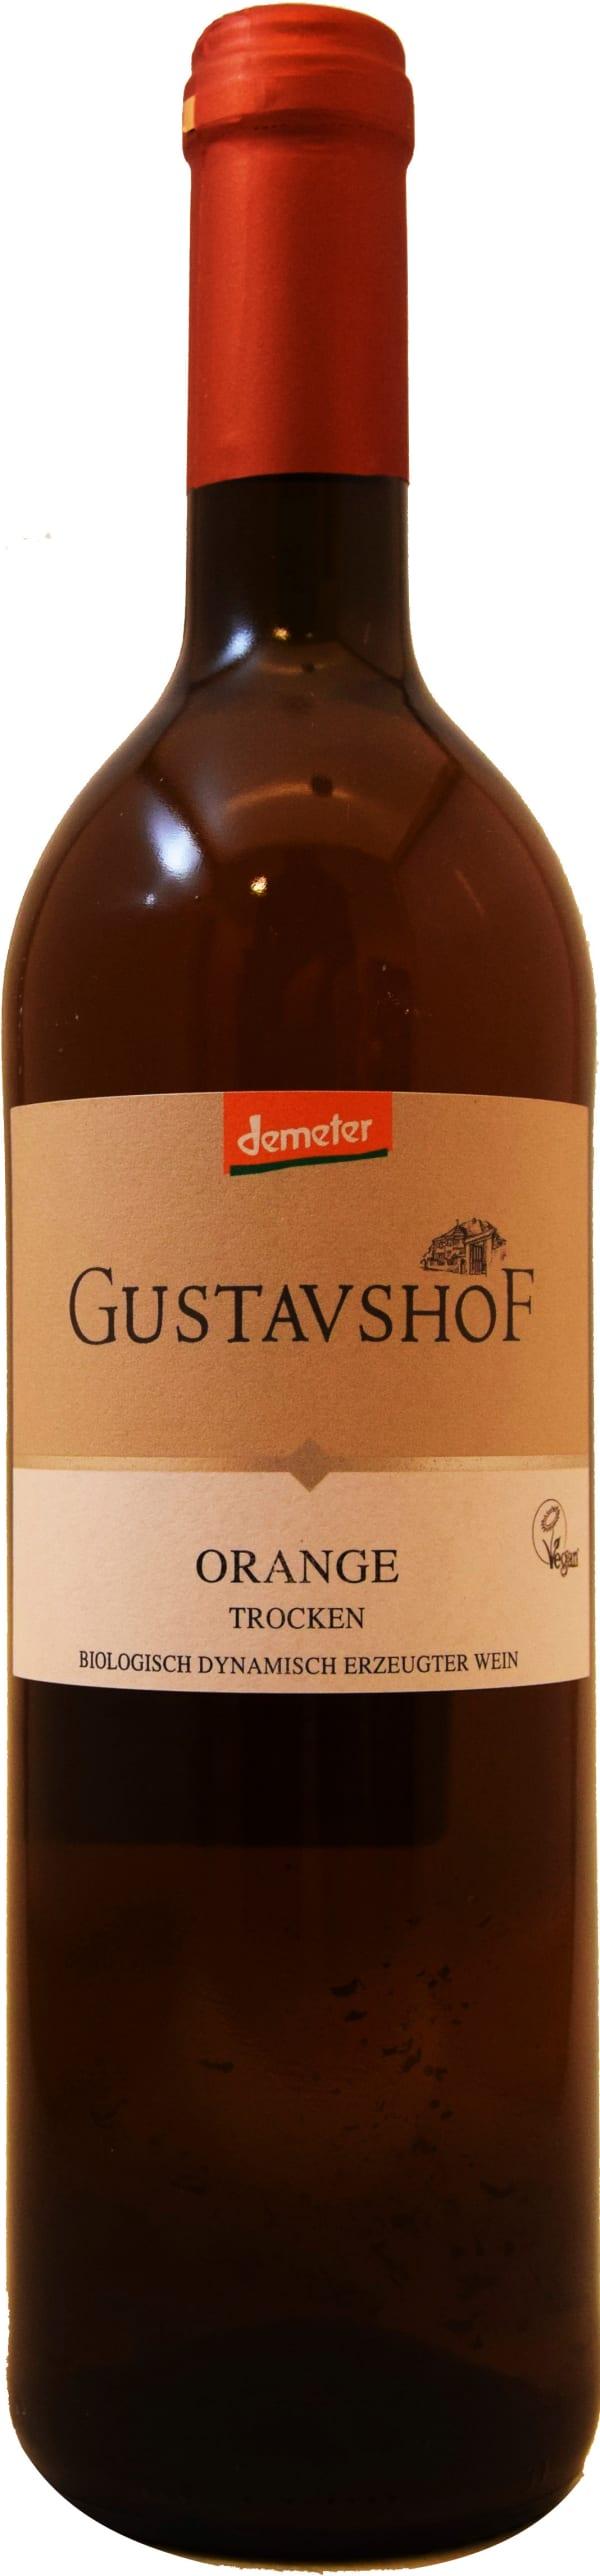 Gustavshof Orange Trocken 2015